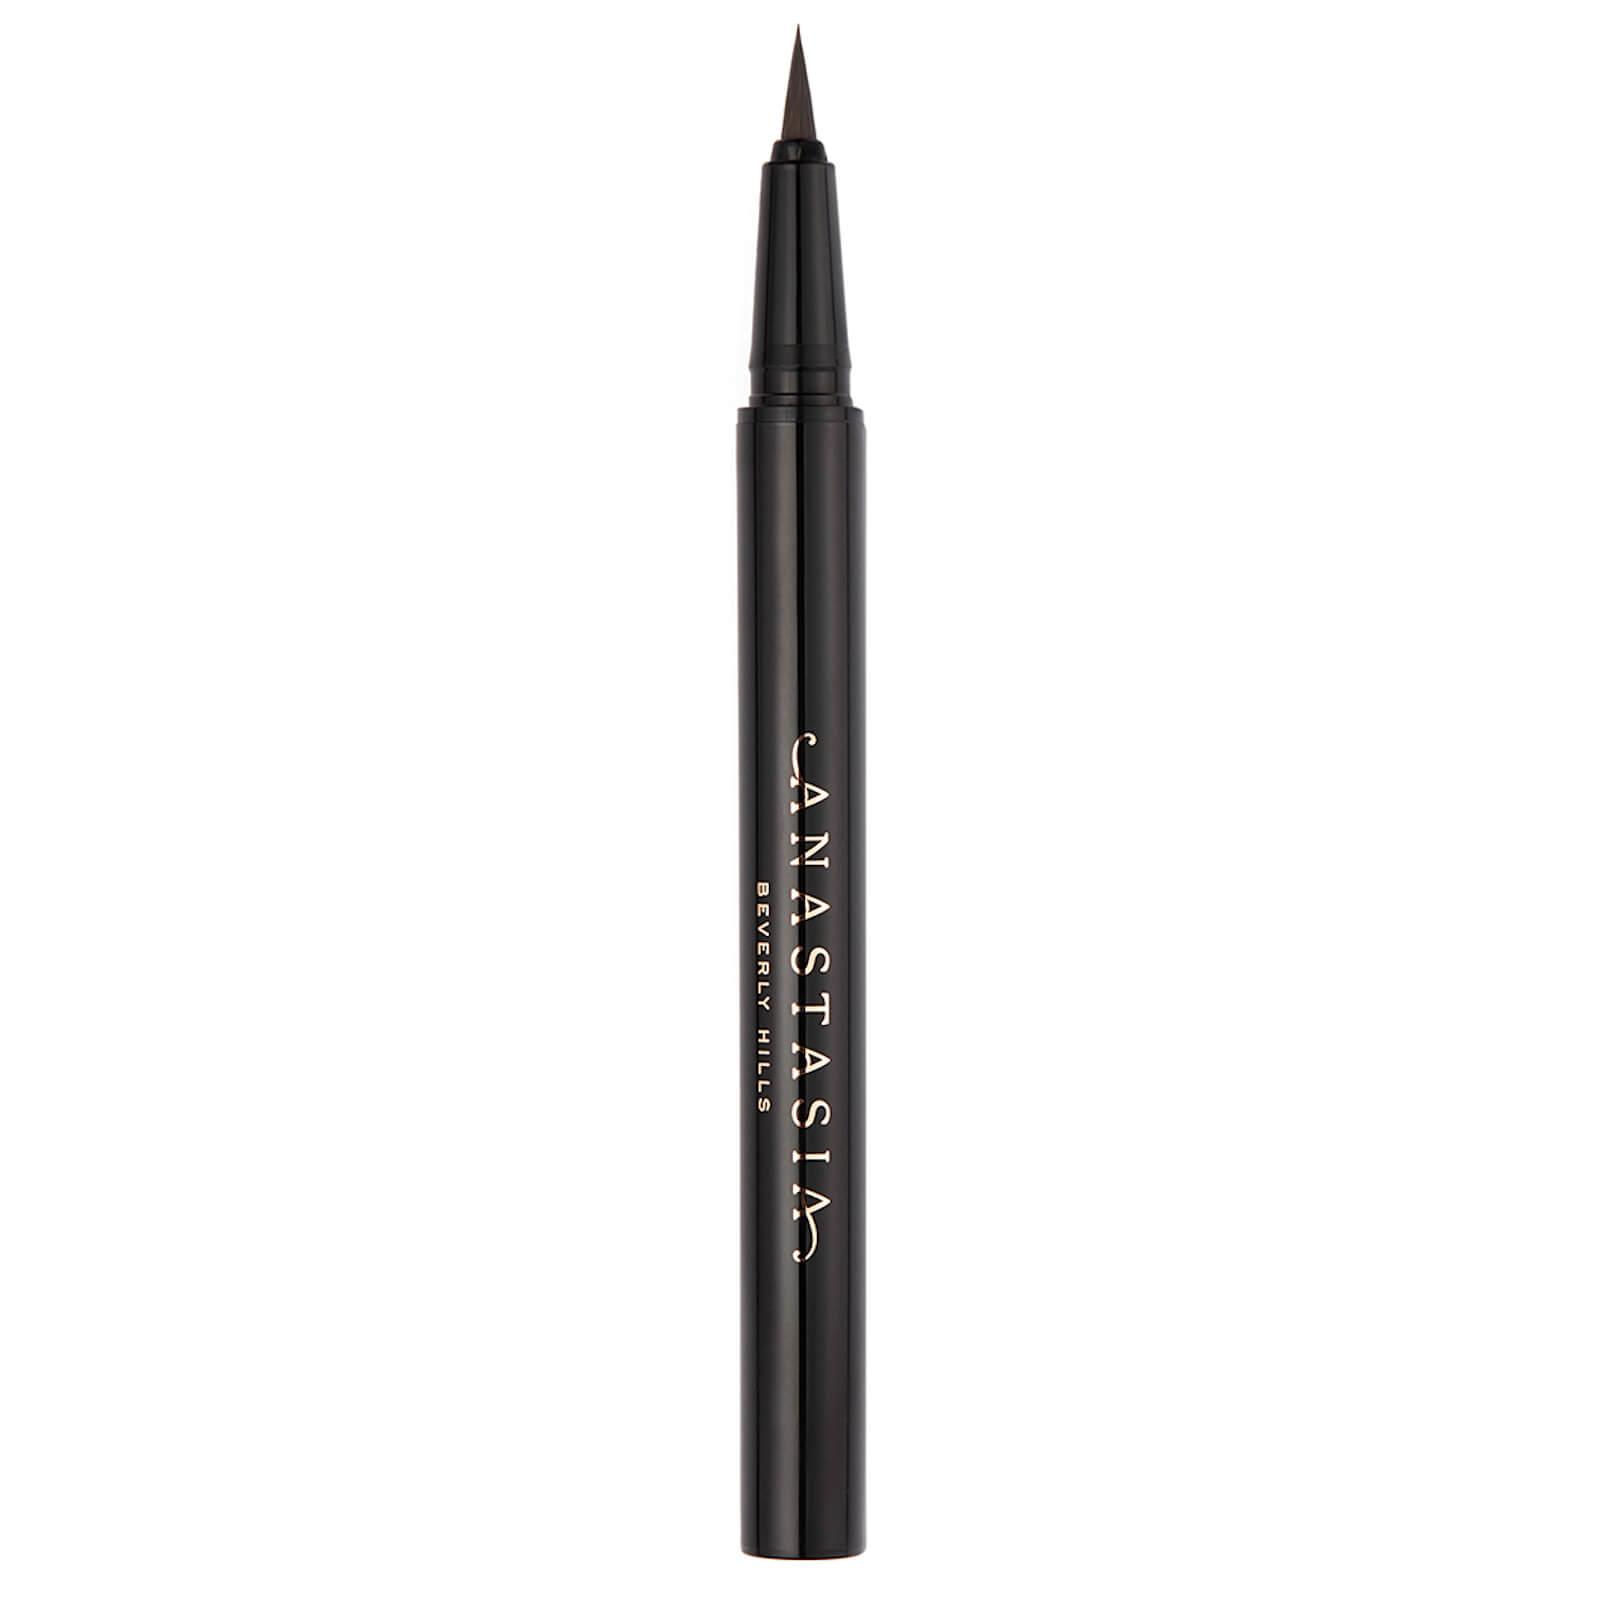 Купить Anastasia Beverly Hills Brow Pen 0.5ml (Various Shades) - Soft Brown